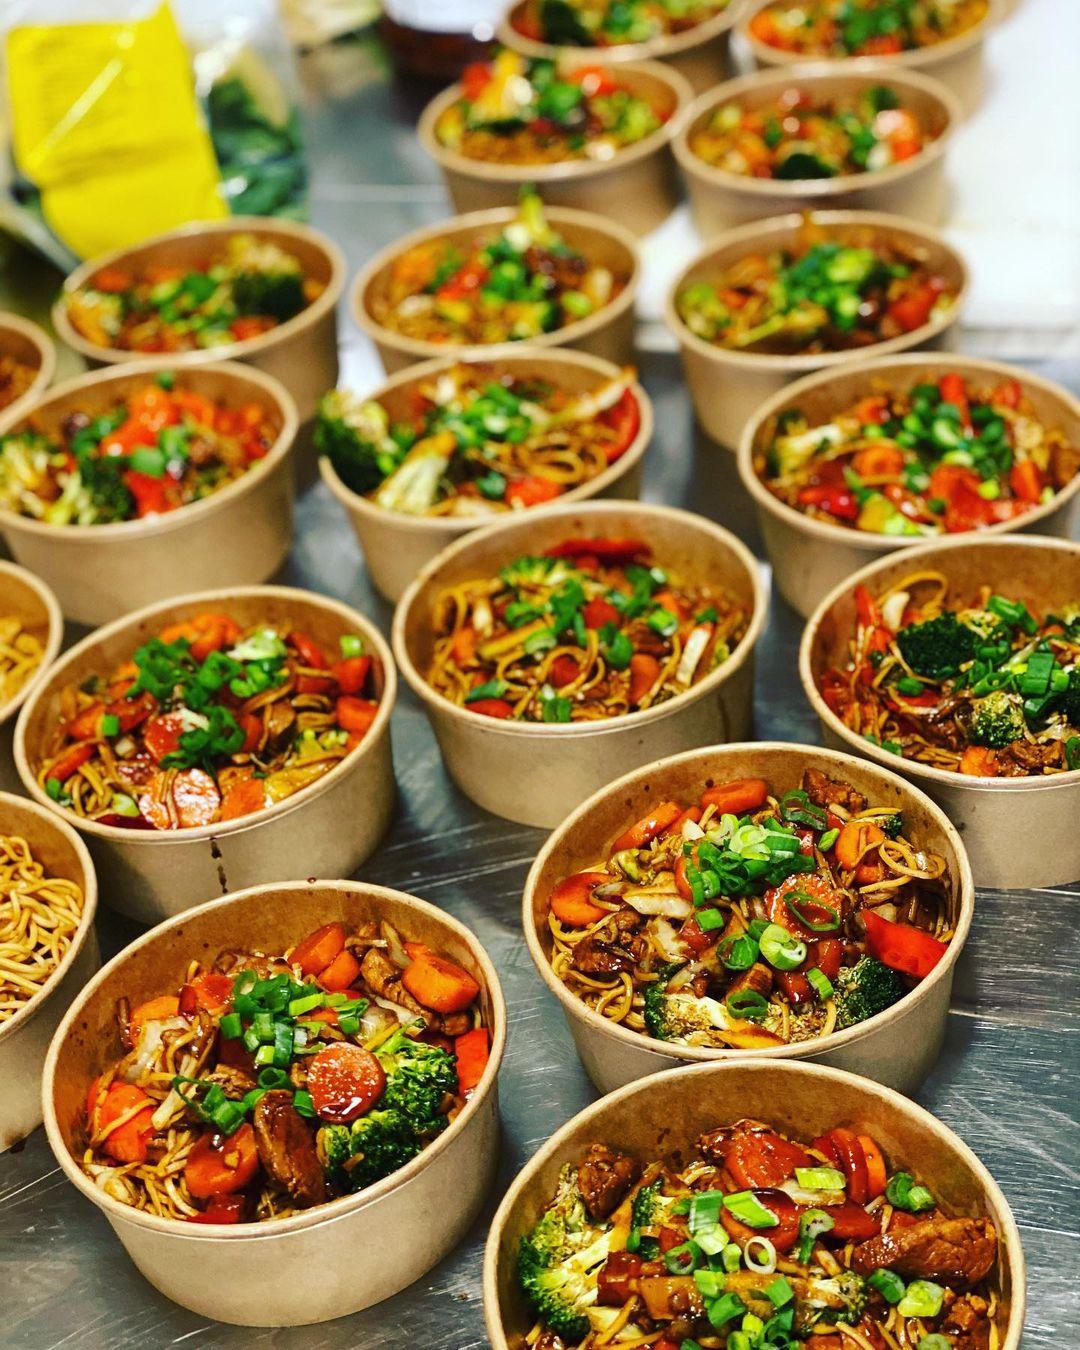 Lunchdags på Ellys, skålar med mat